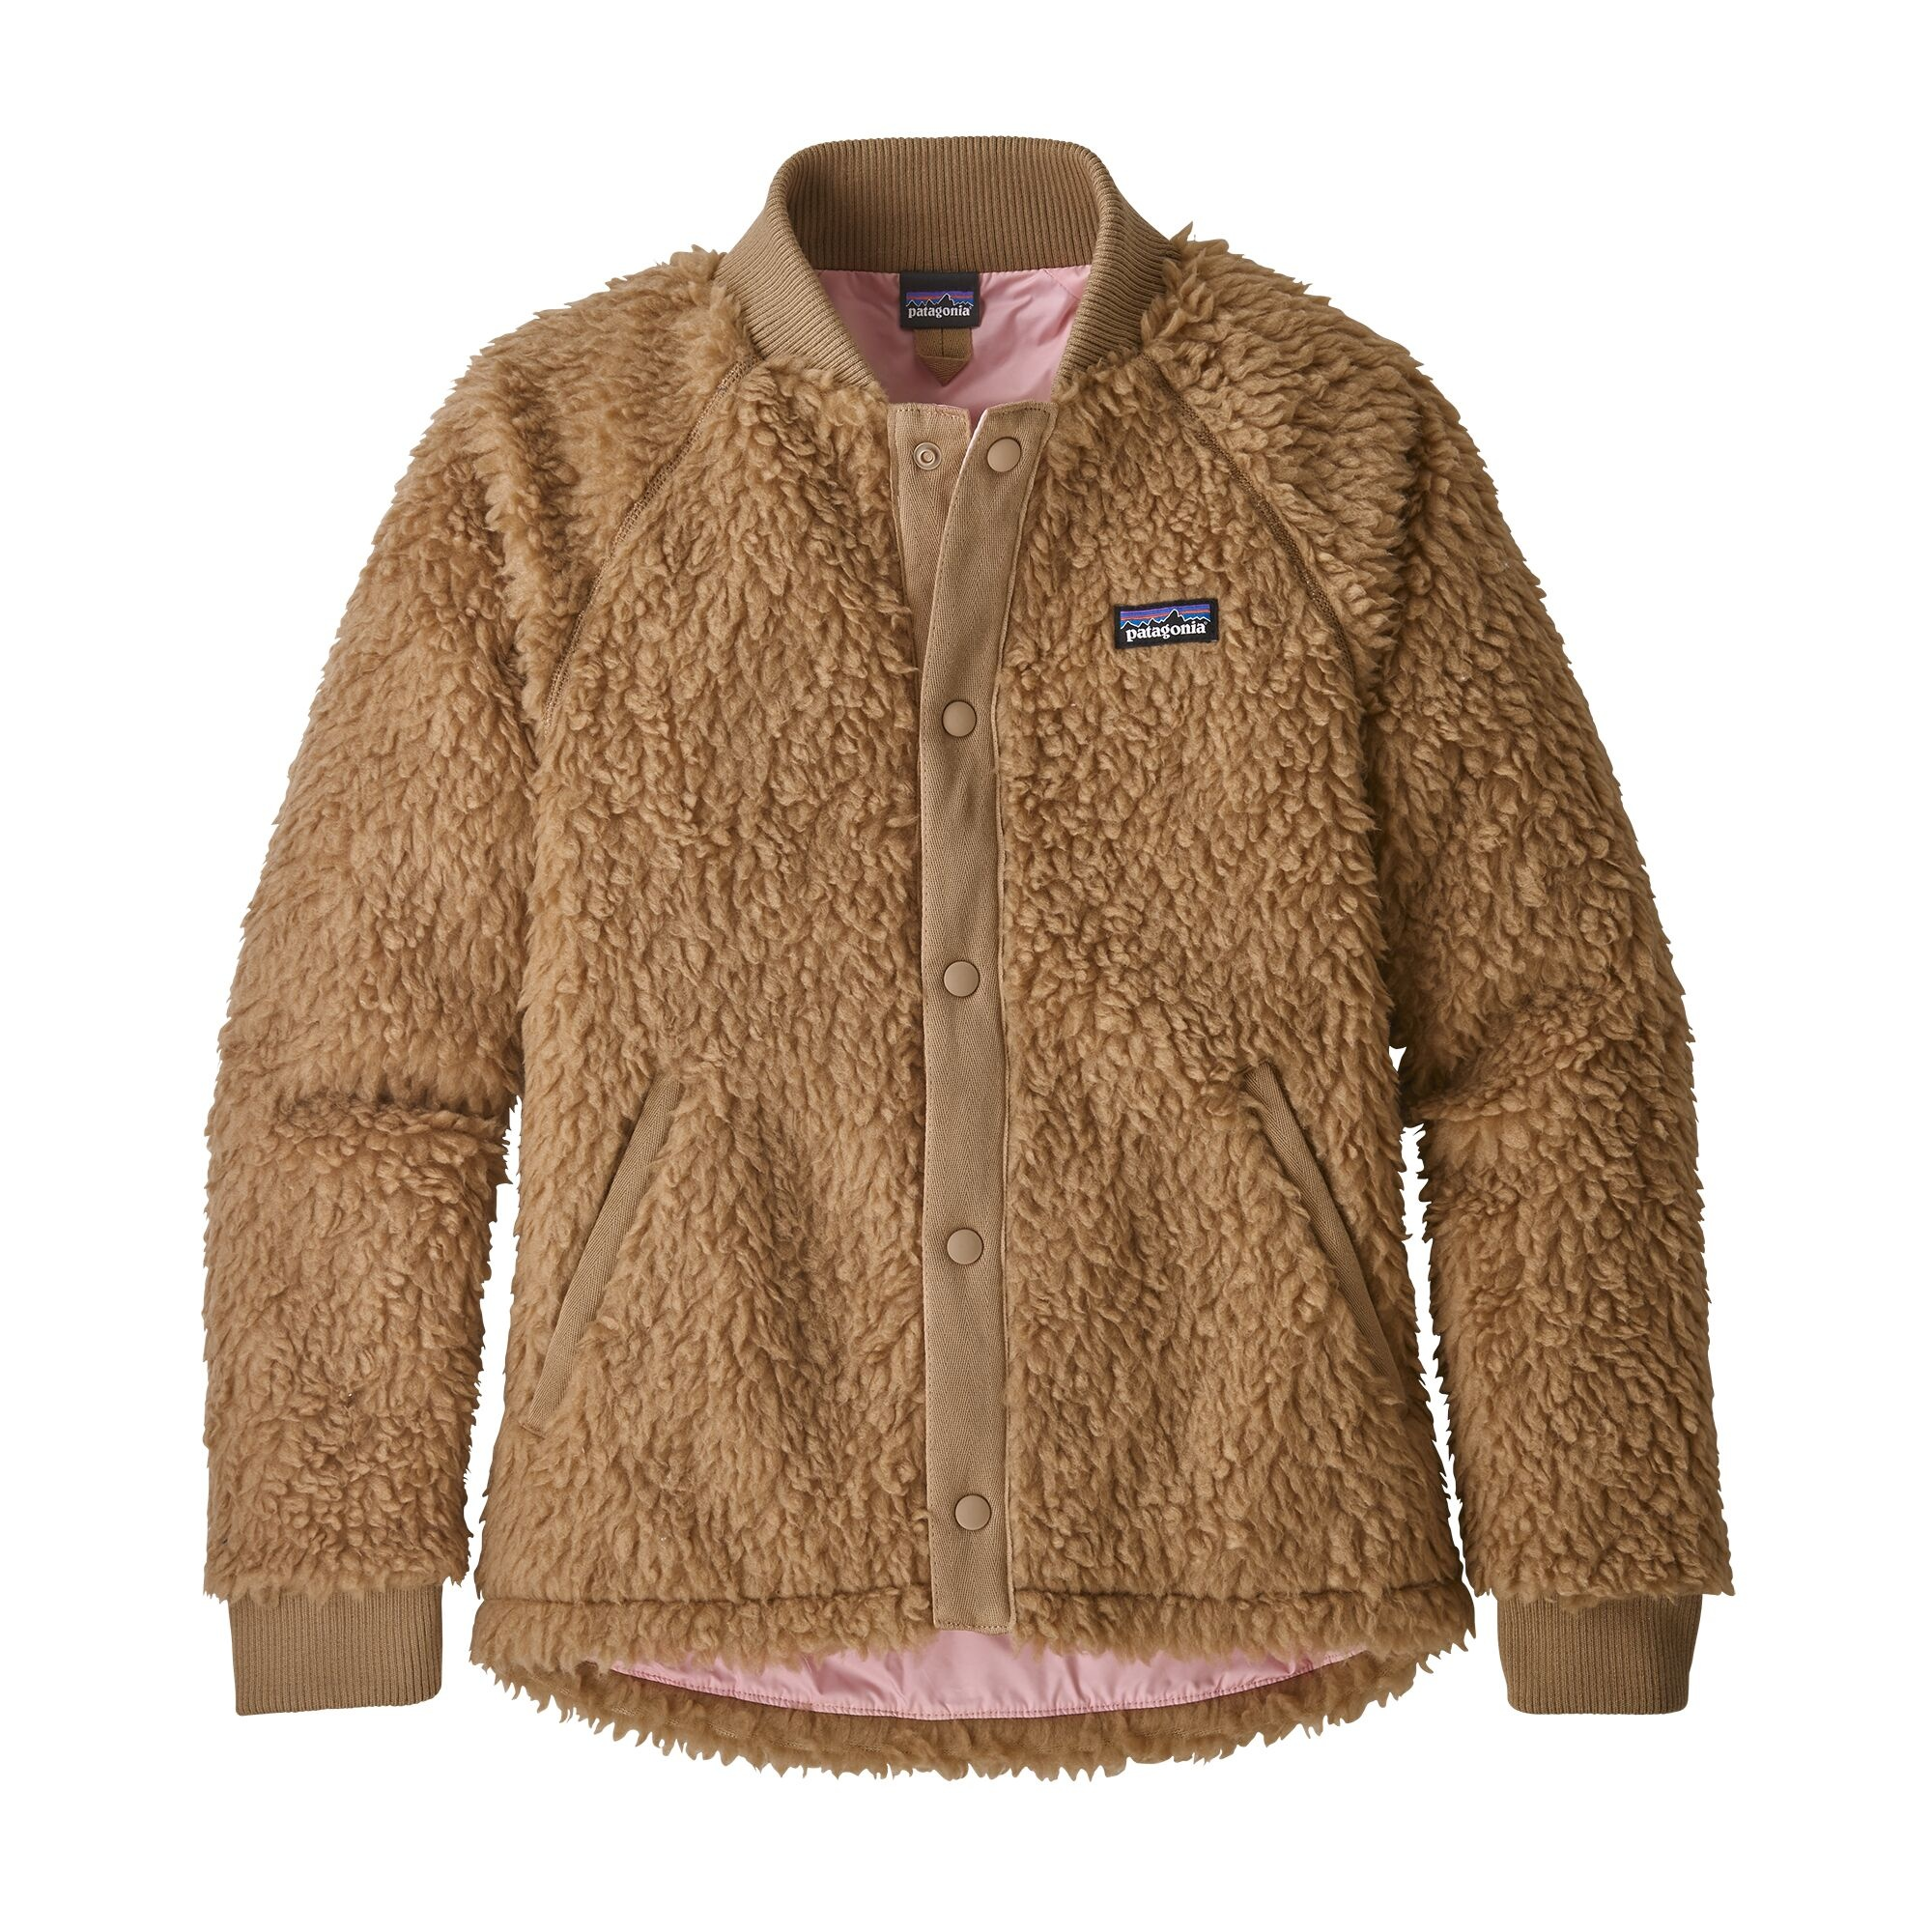 85c035d9f Patagonia Girls Retro-X Fleece Bomber Jacket